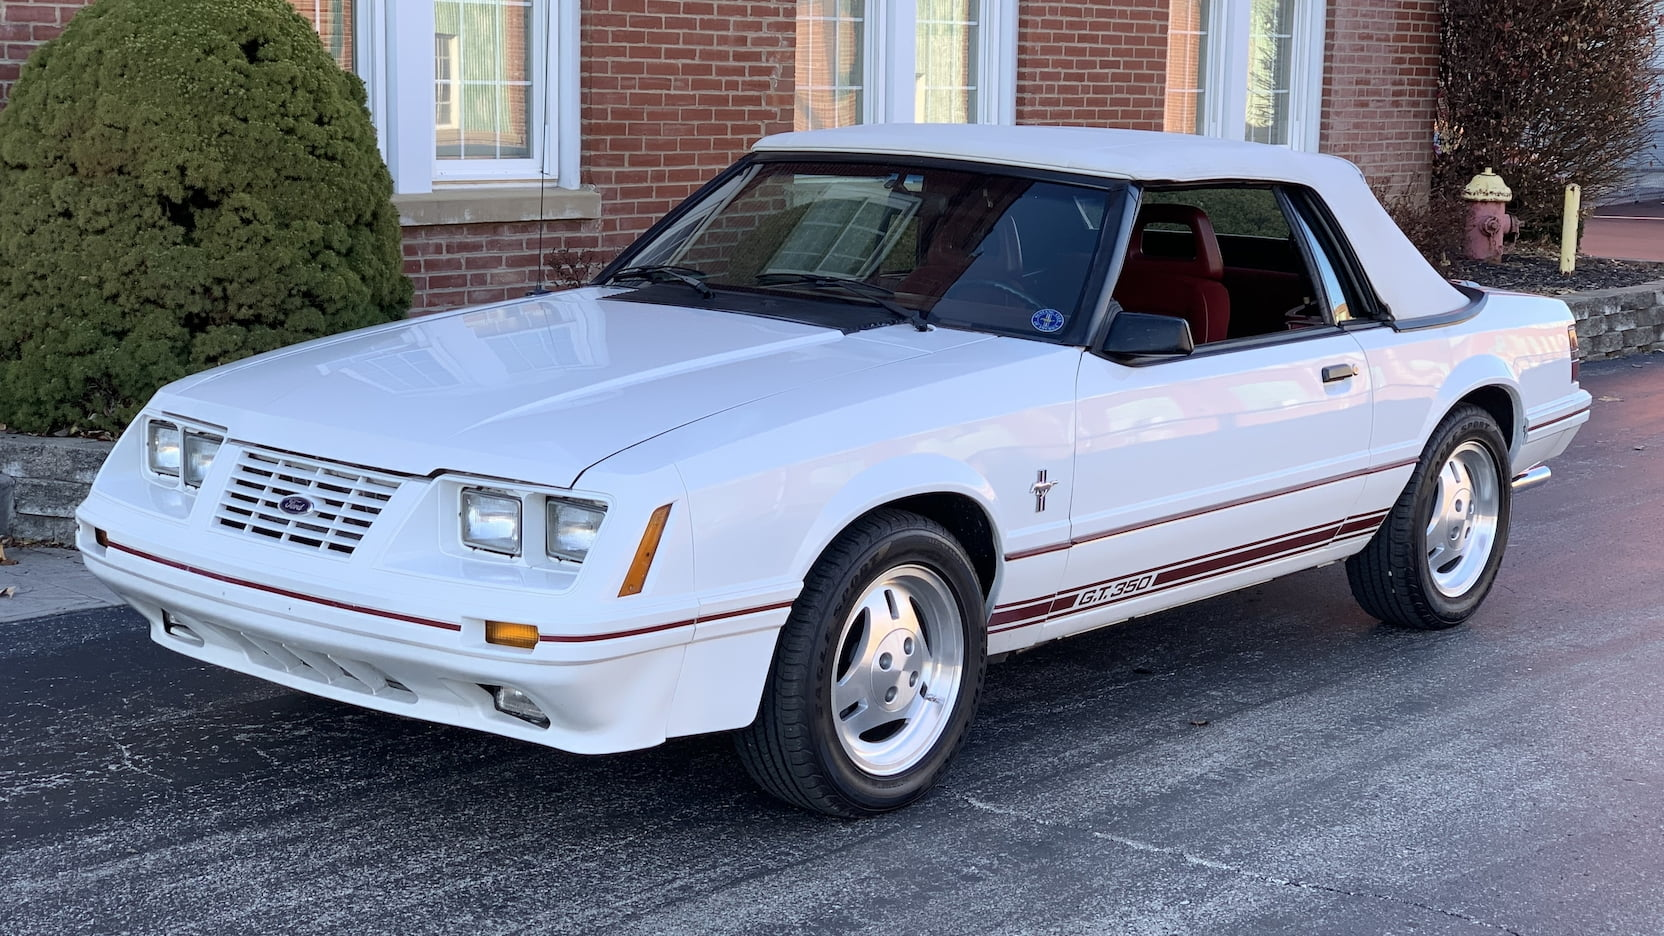 1984 Mustang Colors